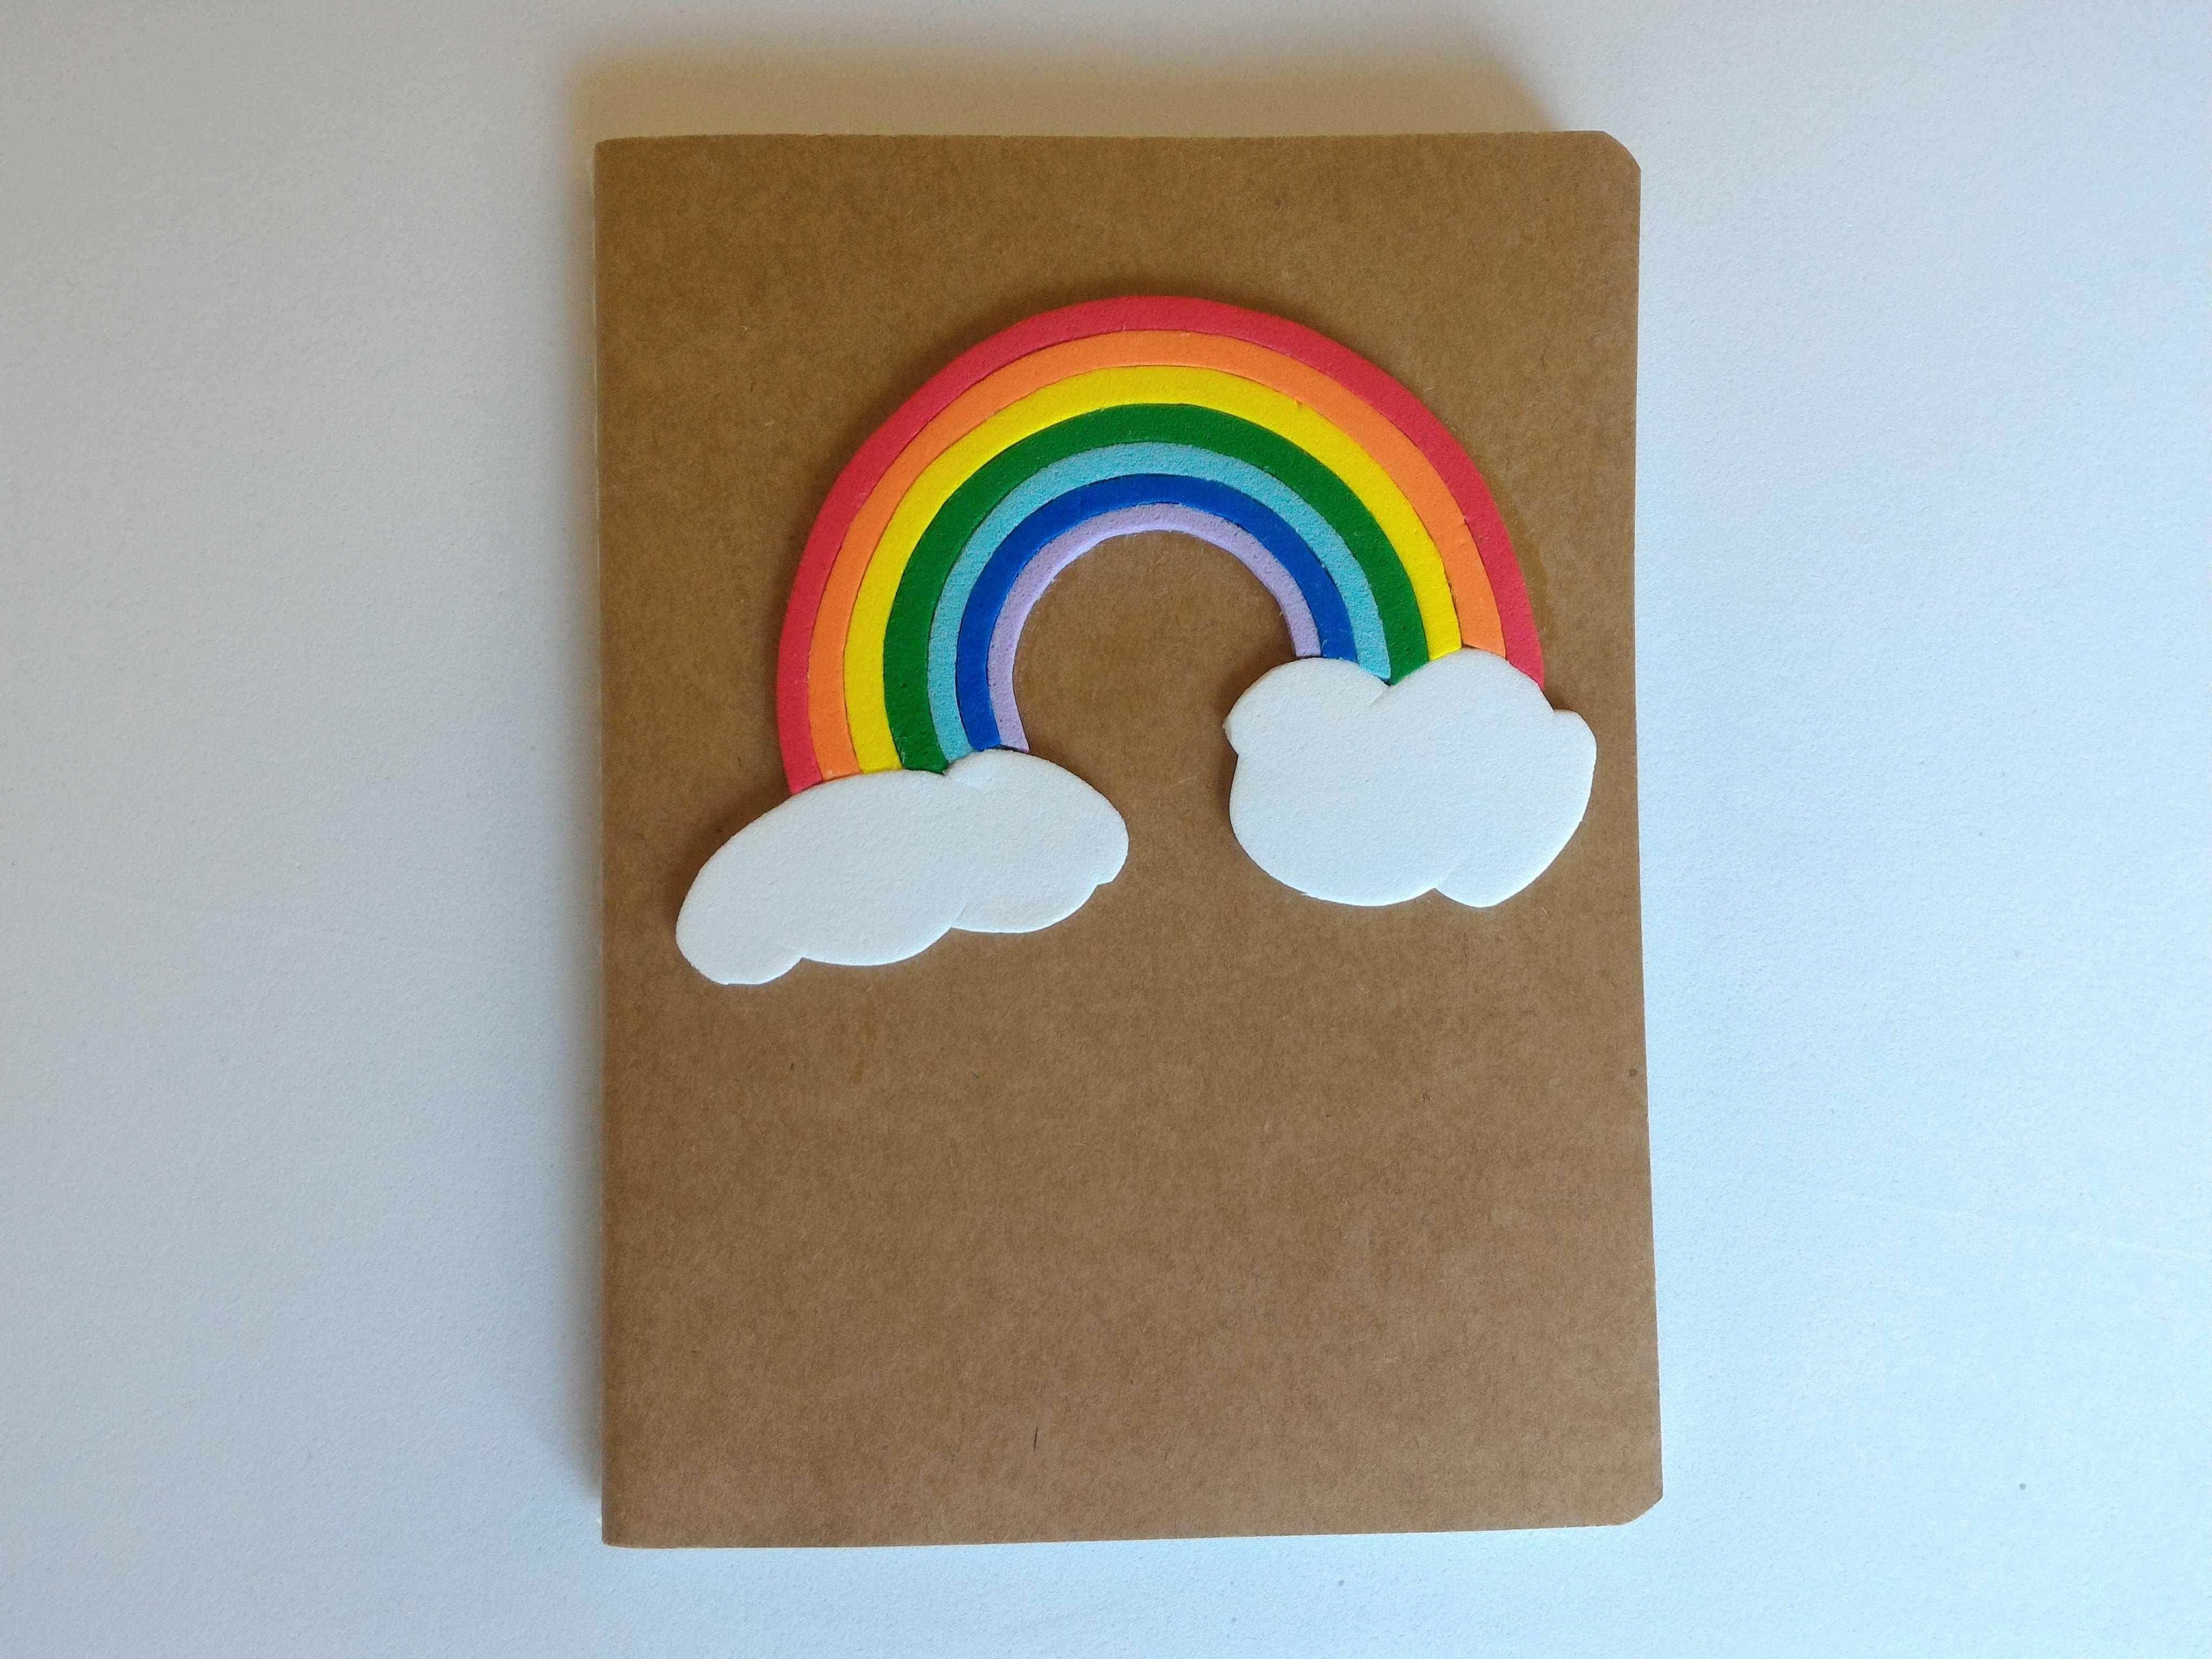 Medium 14   oam   ouiareclafc   rainbow   chagaz et vous